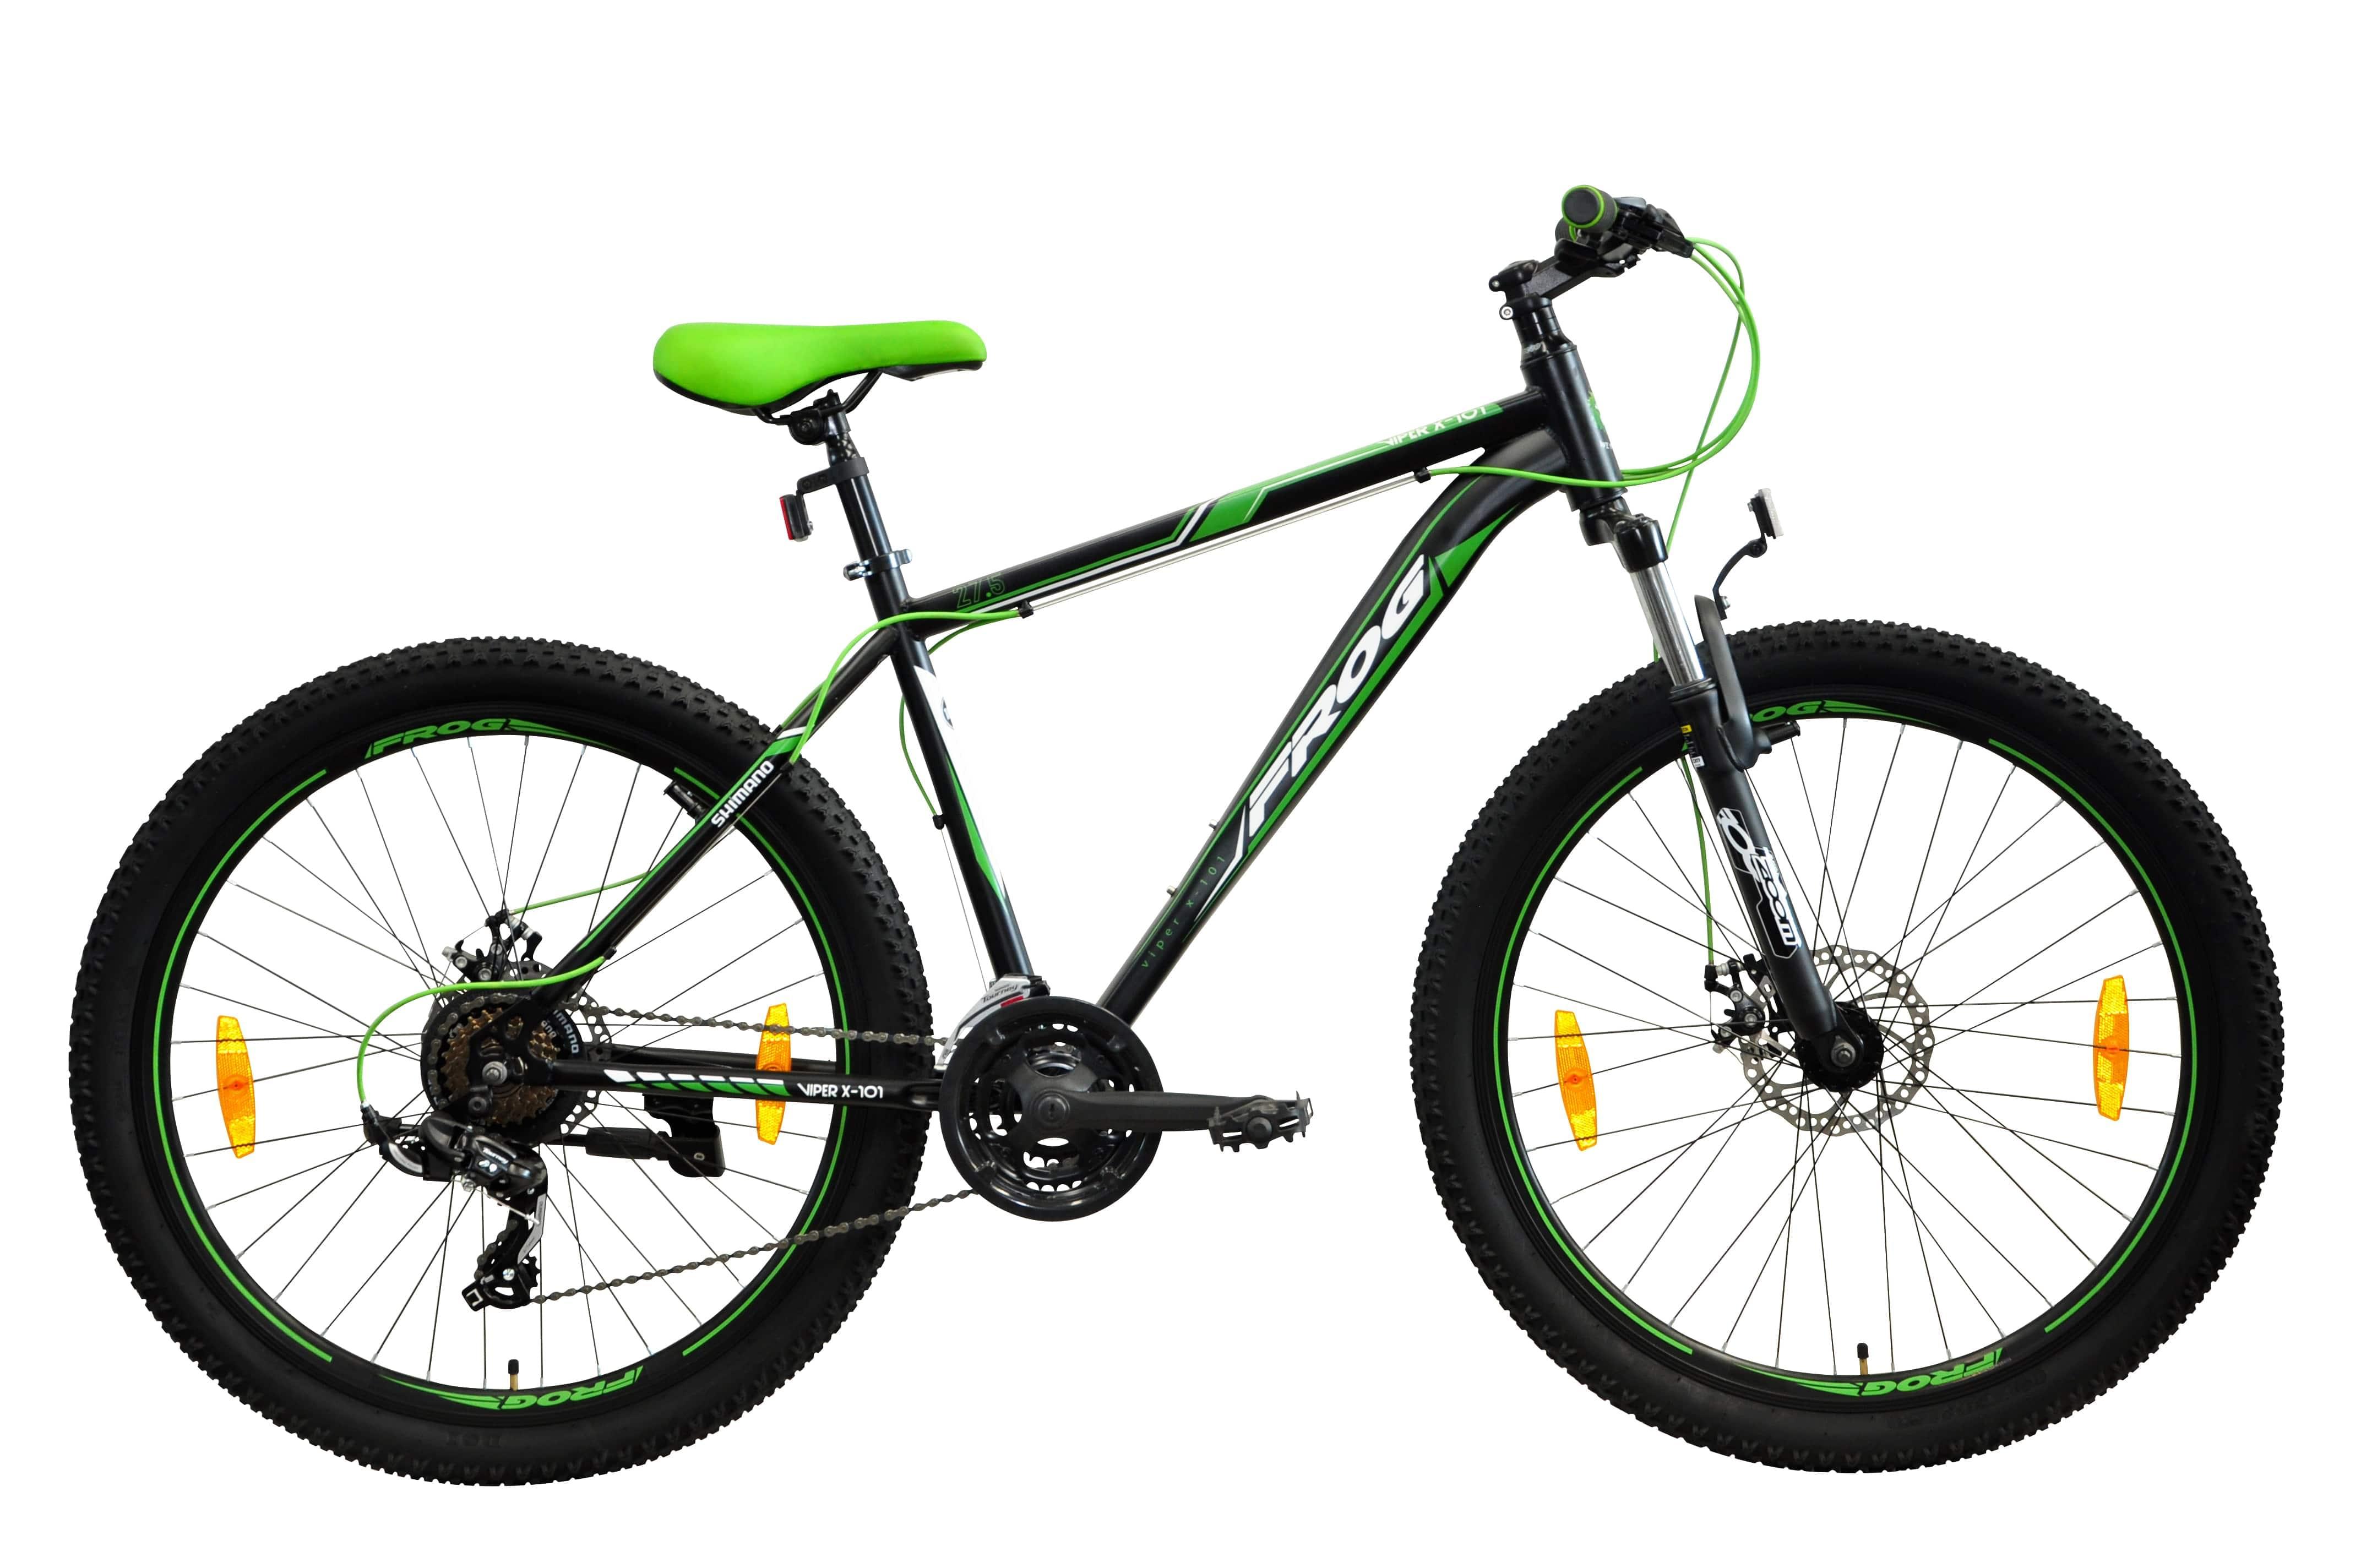 Viper X 101 27 5 Black Green image 1